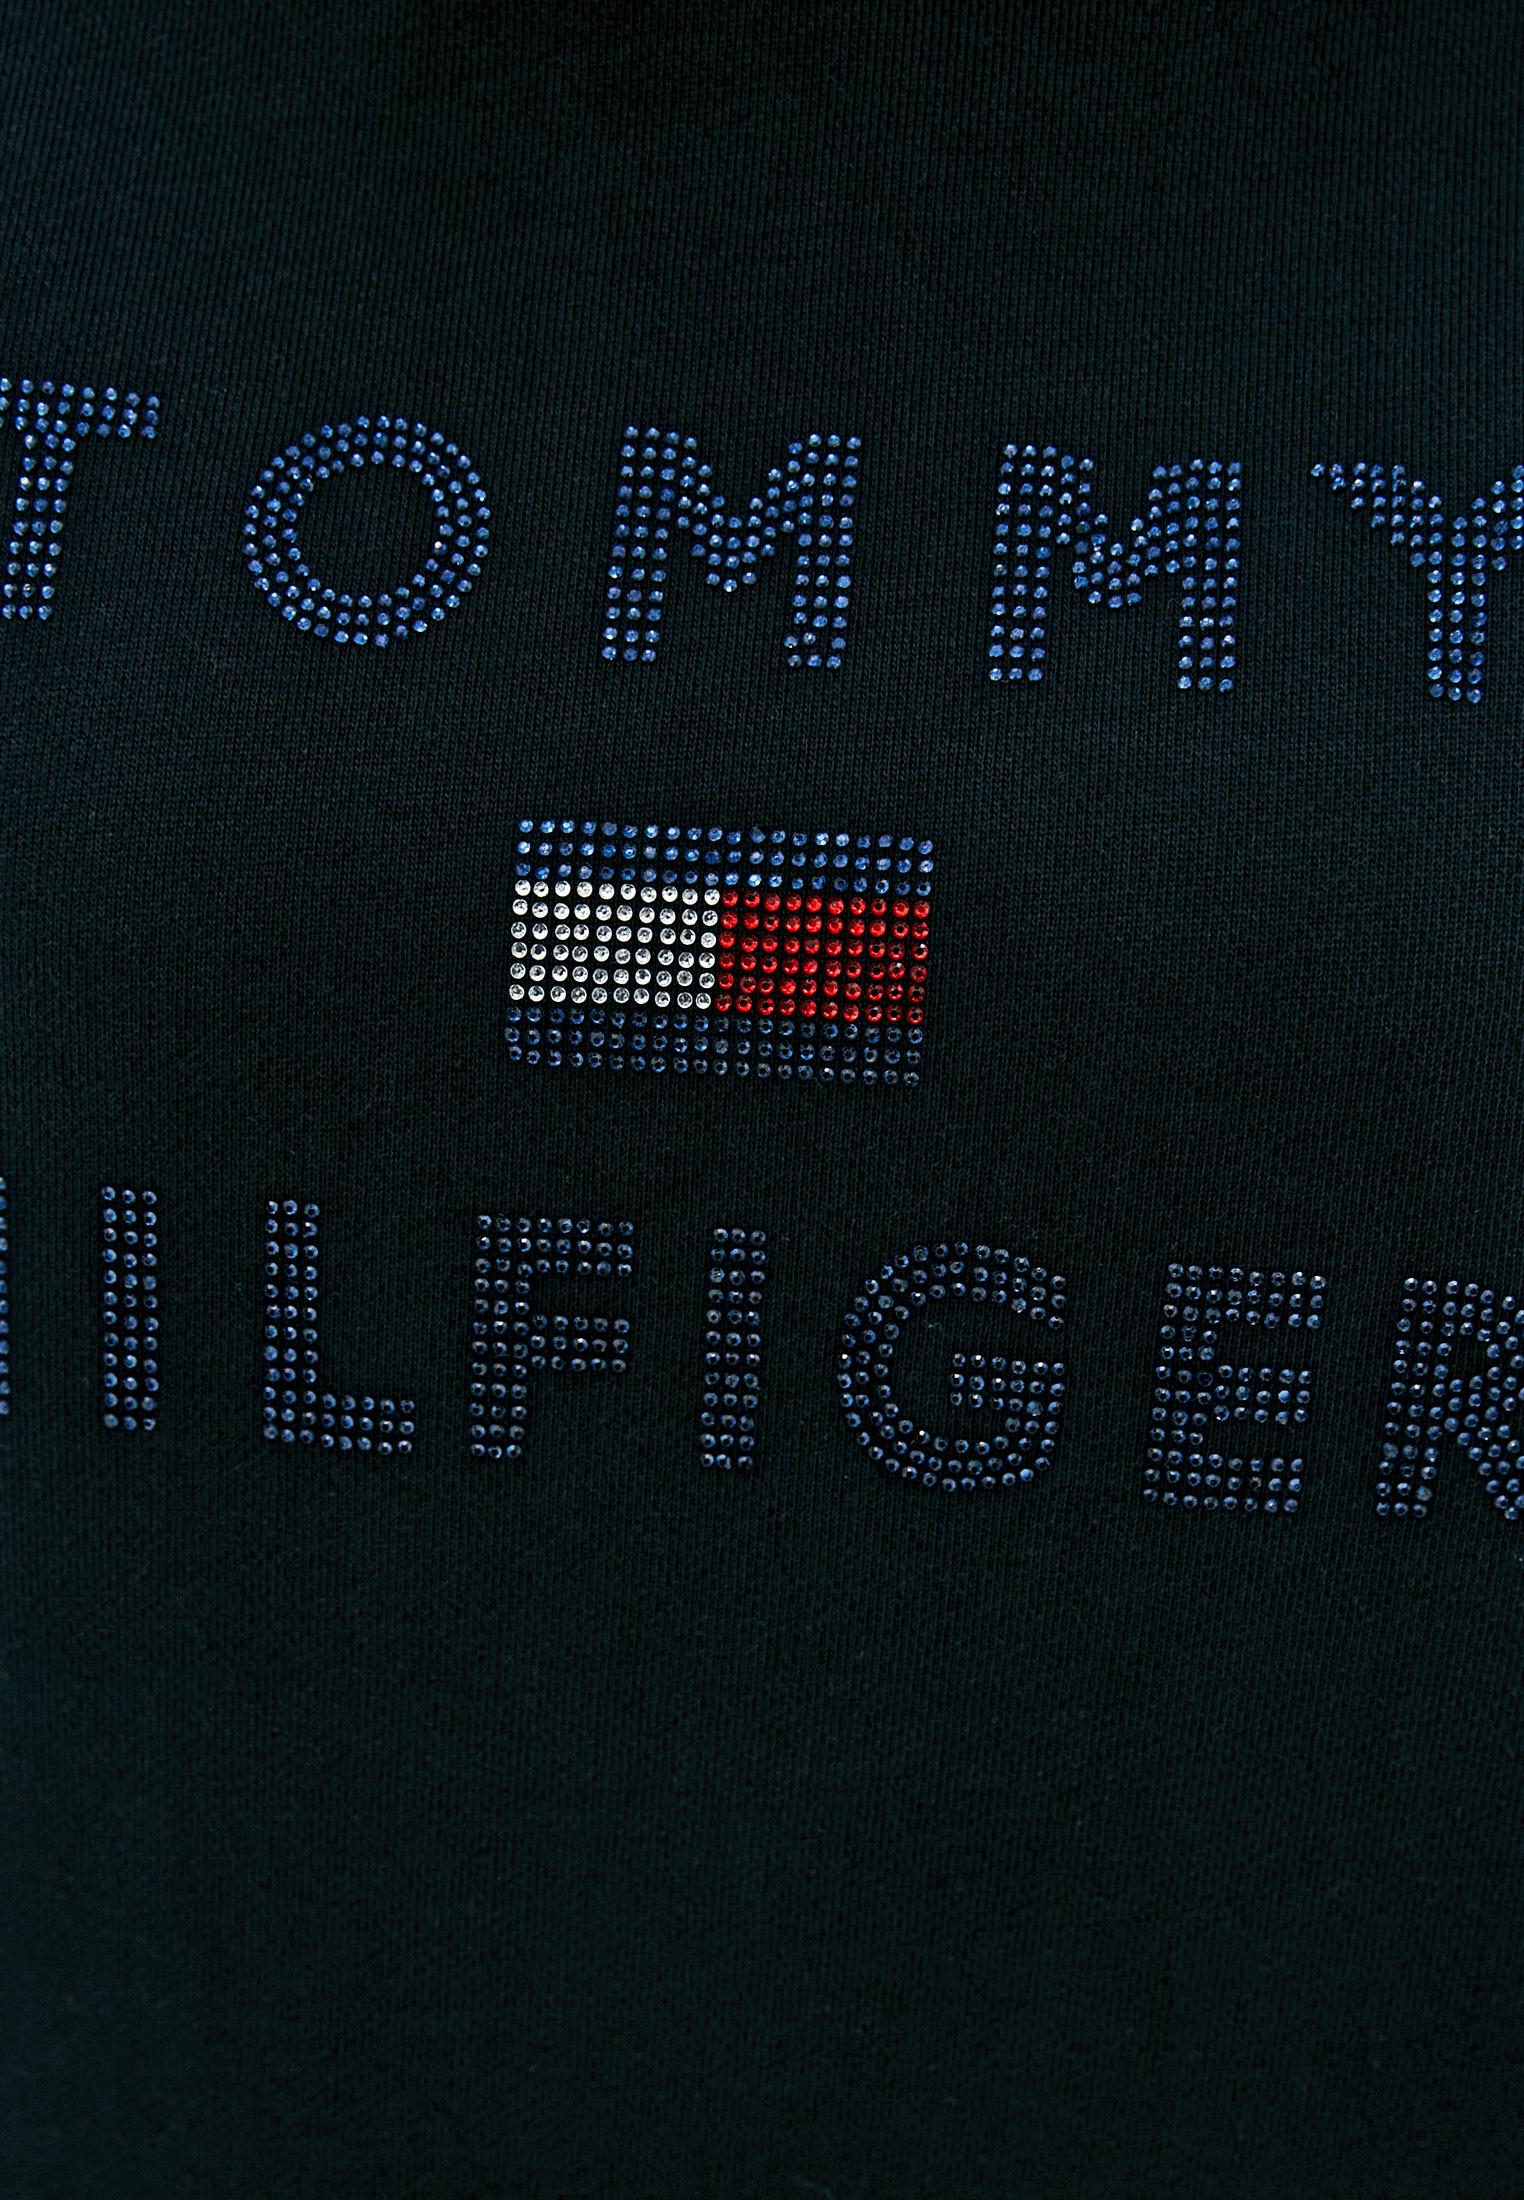 Платье Tommy Hilfiger (Томми Хилфигер) WW0WW31086: изображение 4